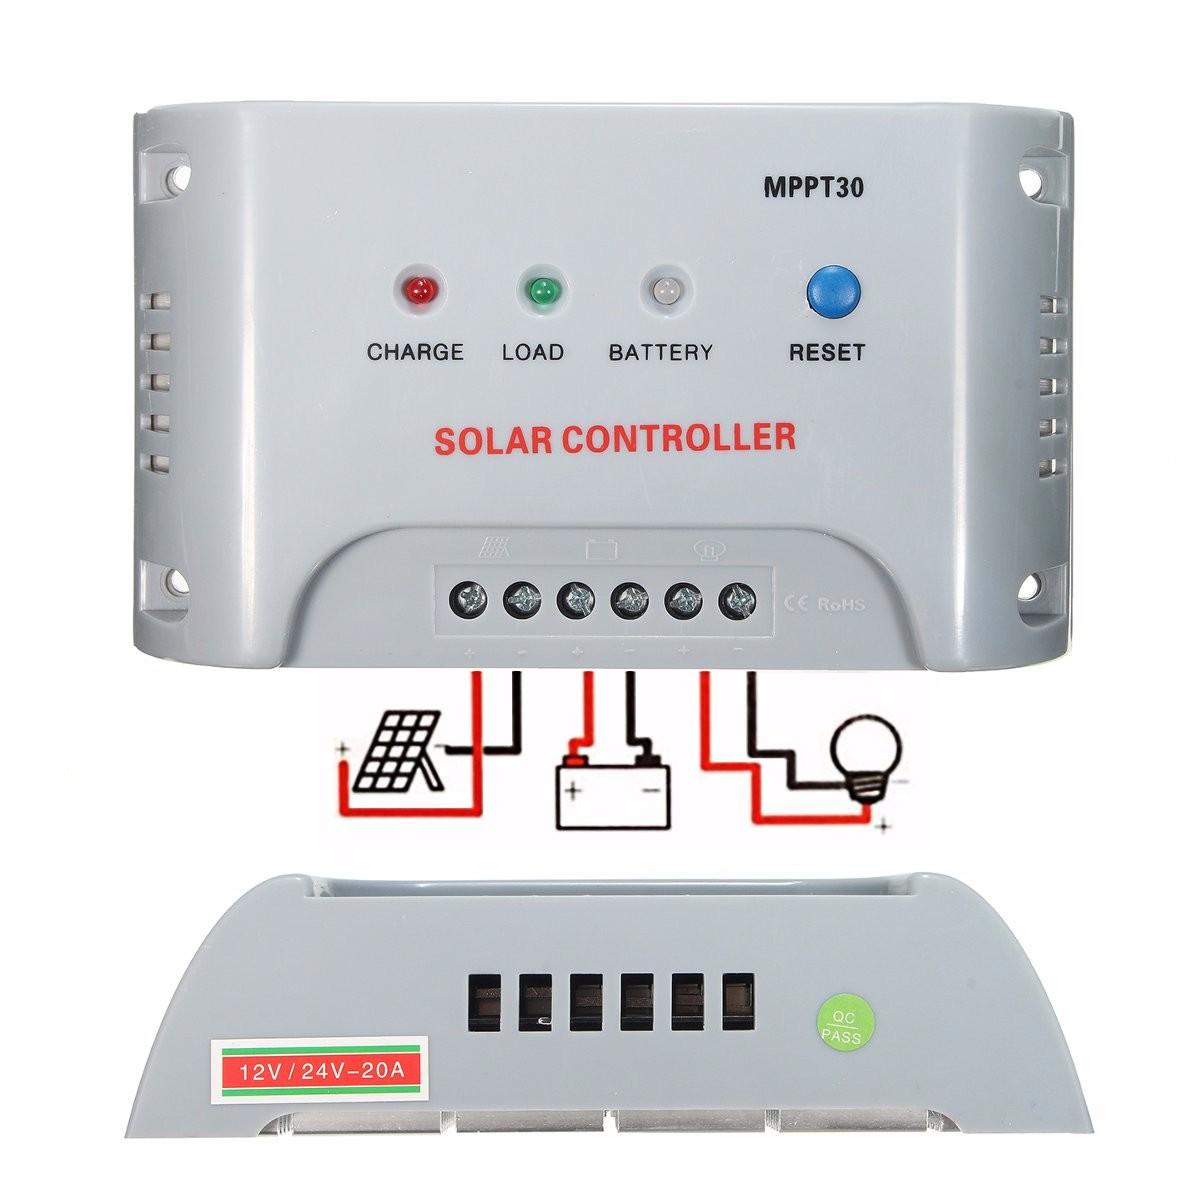 Назначение МРРТ-контроллер заряда солнечной батареи